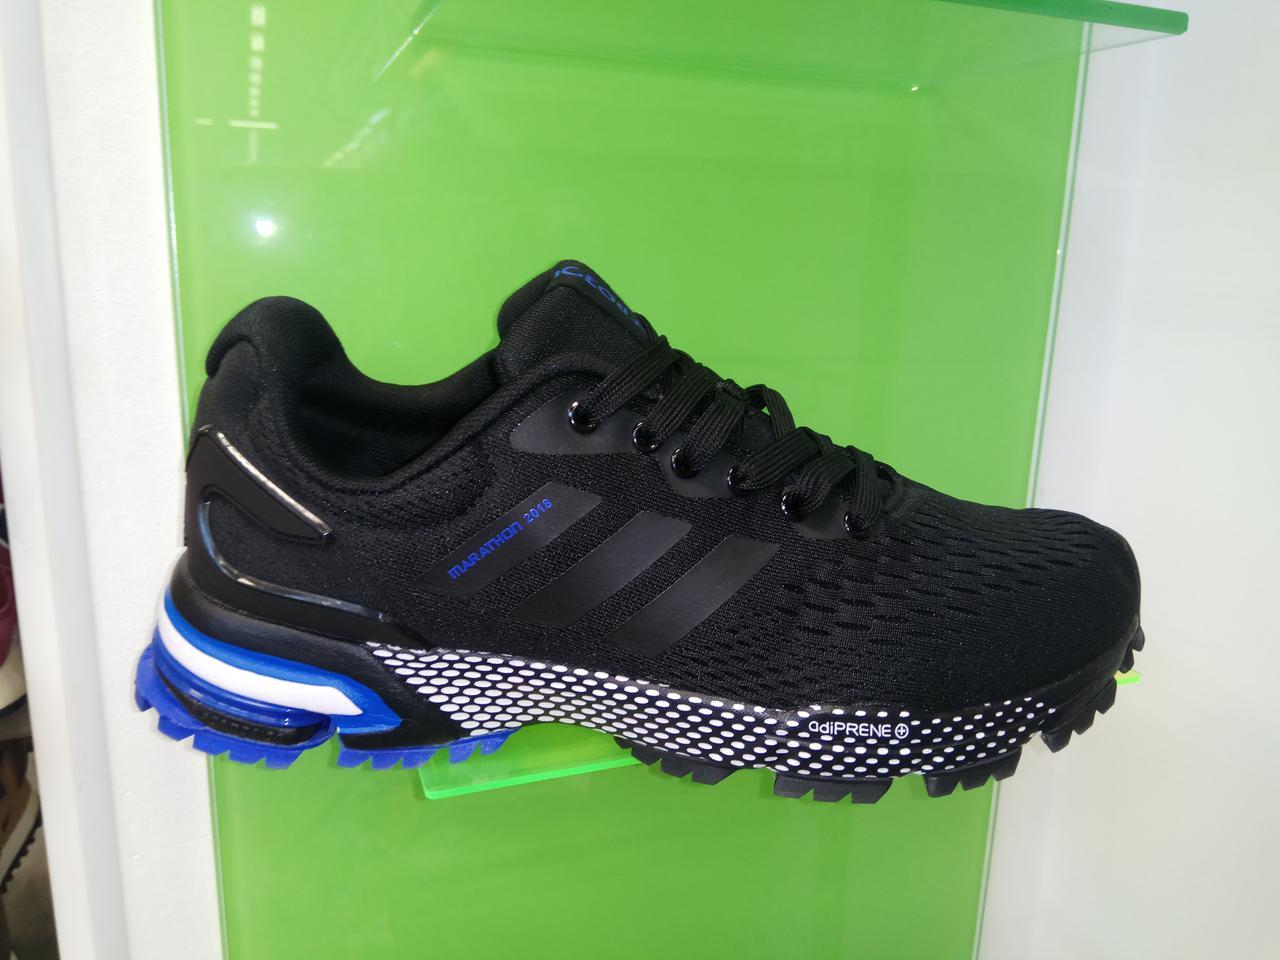 b72cc8fea032 Мужские кроссовки Adidas Marathon 2018 black blue - Интернет магазин  krossovkiweb.kiev.ua в